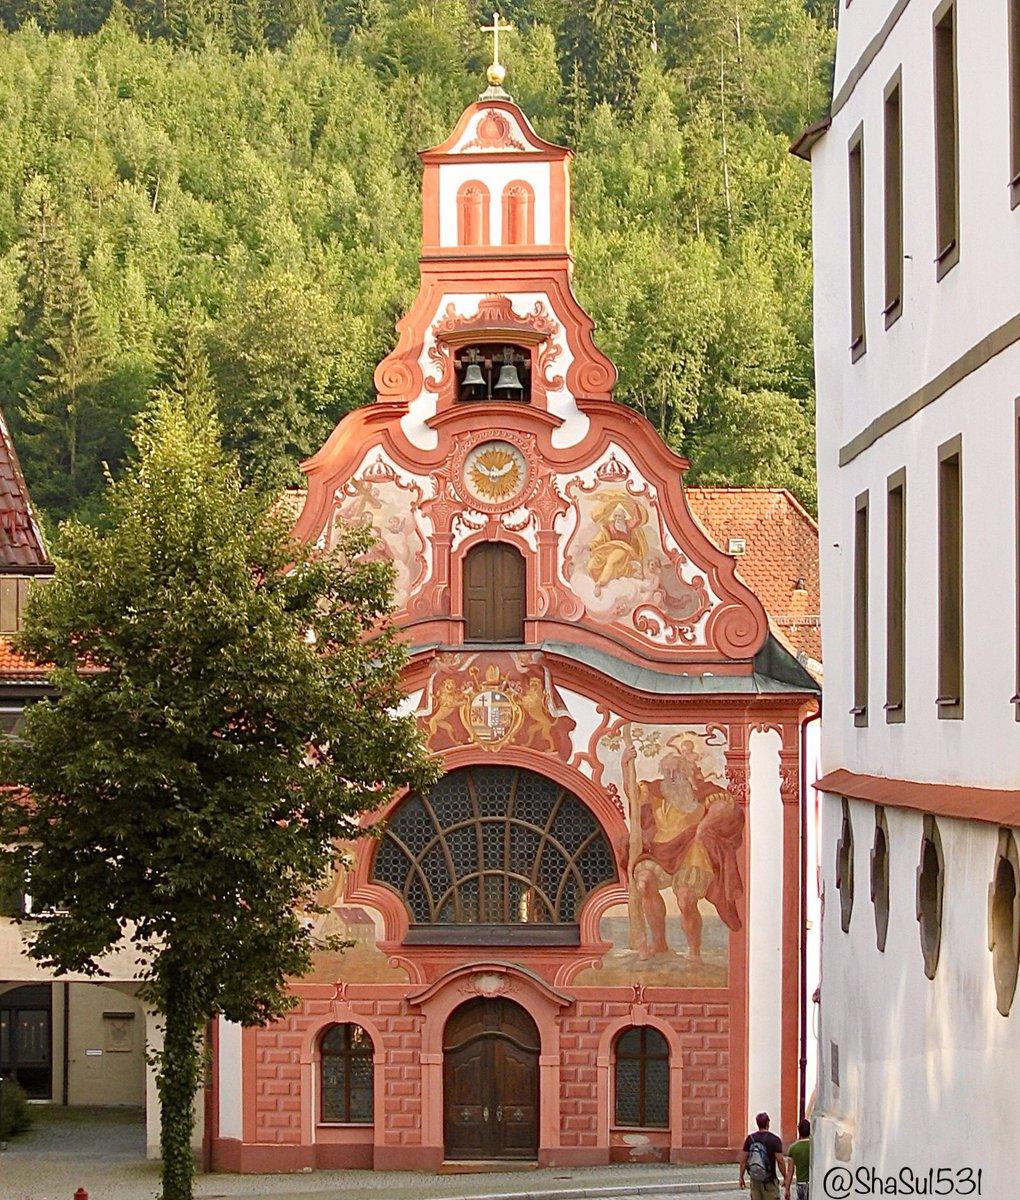 🇩🇪 Bavaria  Füssen #Bavaria, Germany, district of #Ostallgäu   @ThePhotoHour @LensAreLive @YourAwesomePics @jmlpyt #ephotozine #dailyphoto #Füssen #Bayern #Fresco #Frescoes